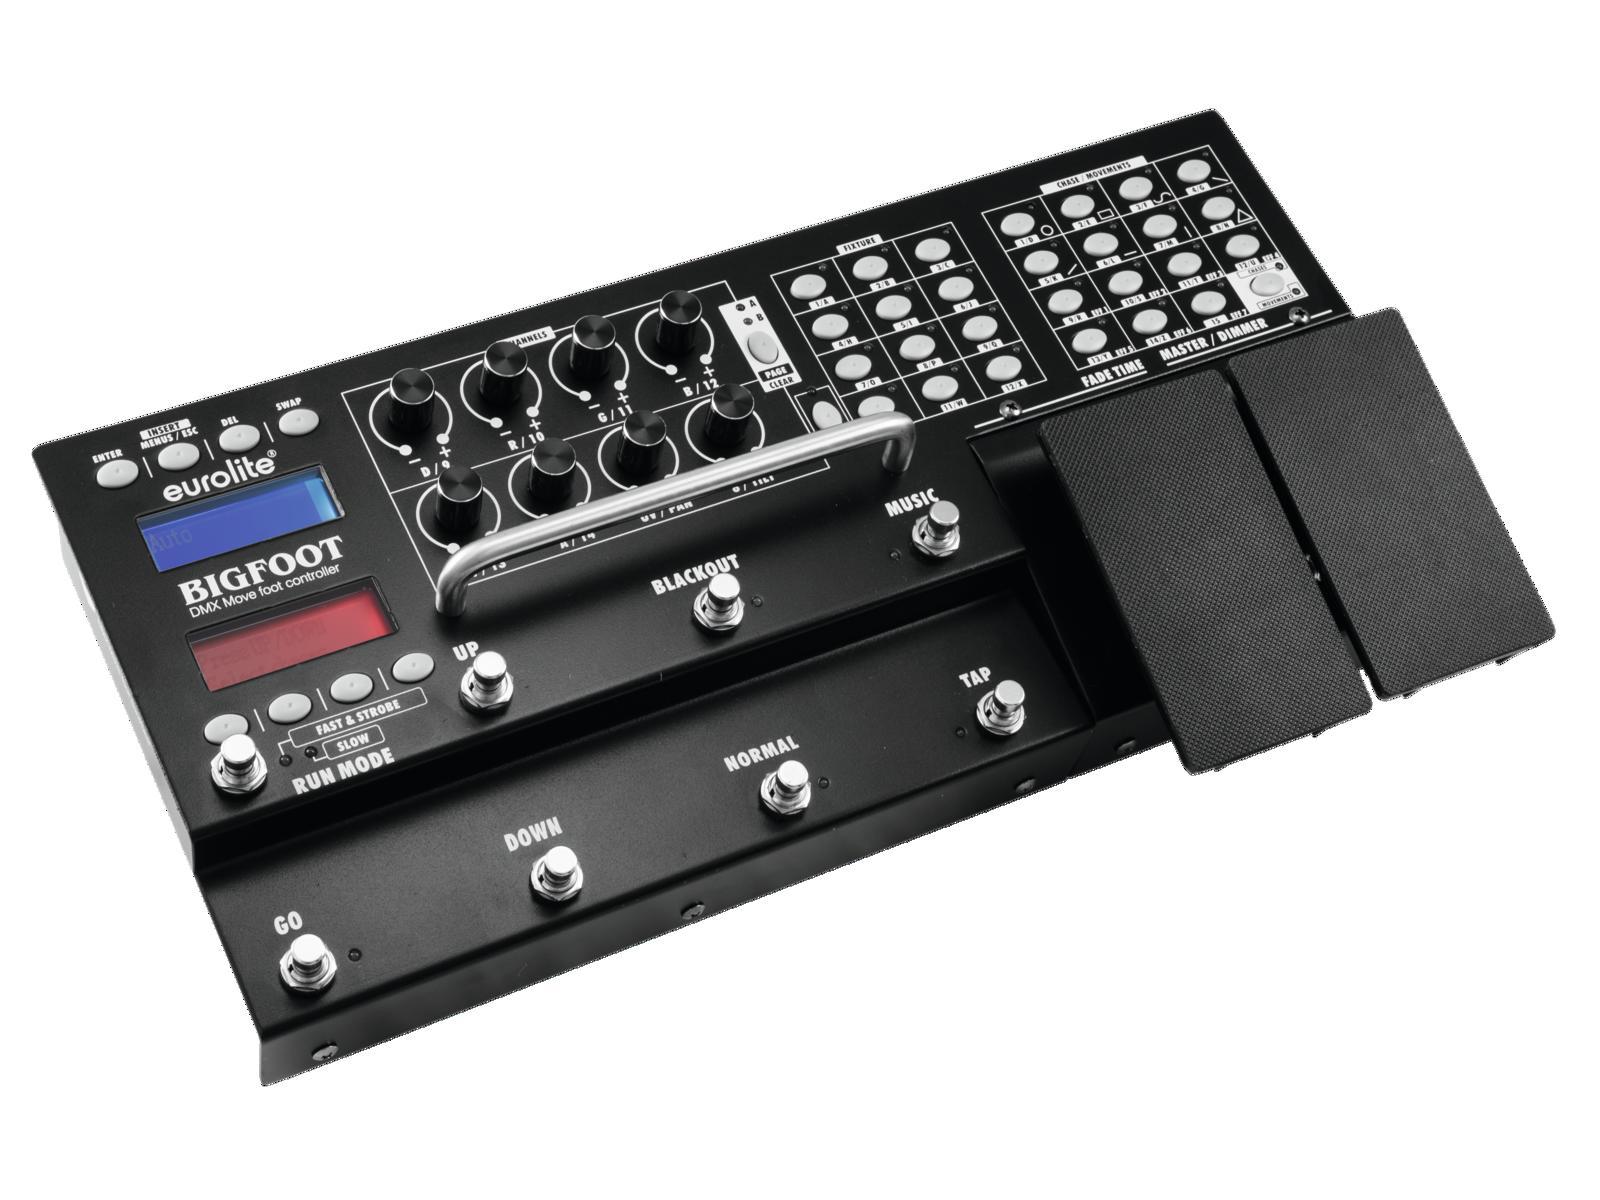 EUROLITE DMX Spostare Bigfoot foot controller 192